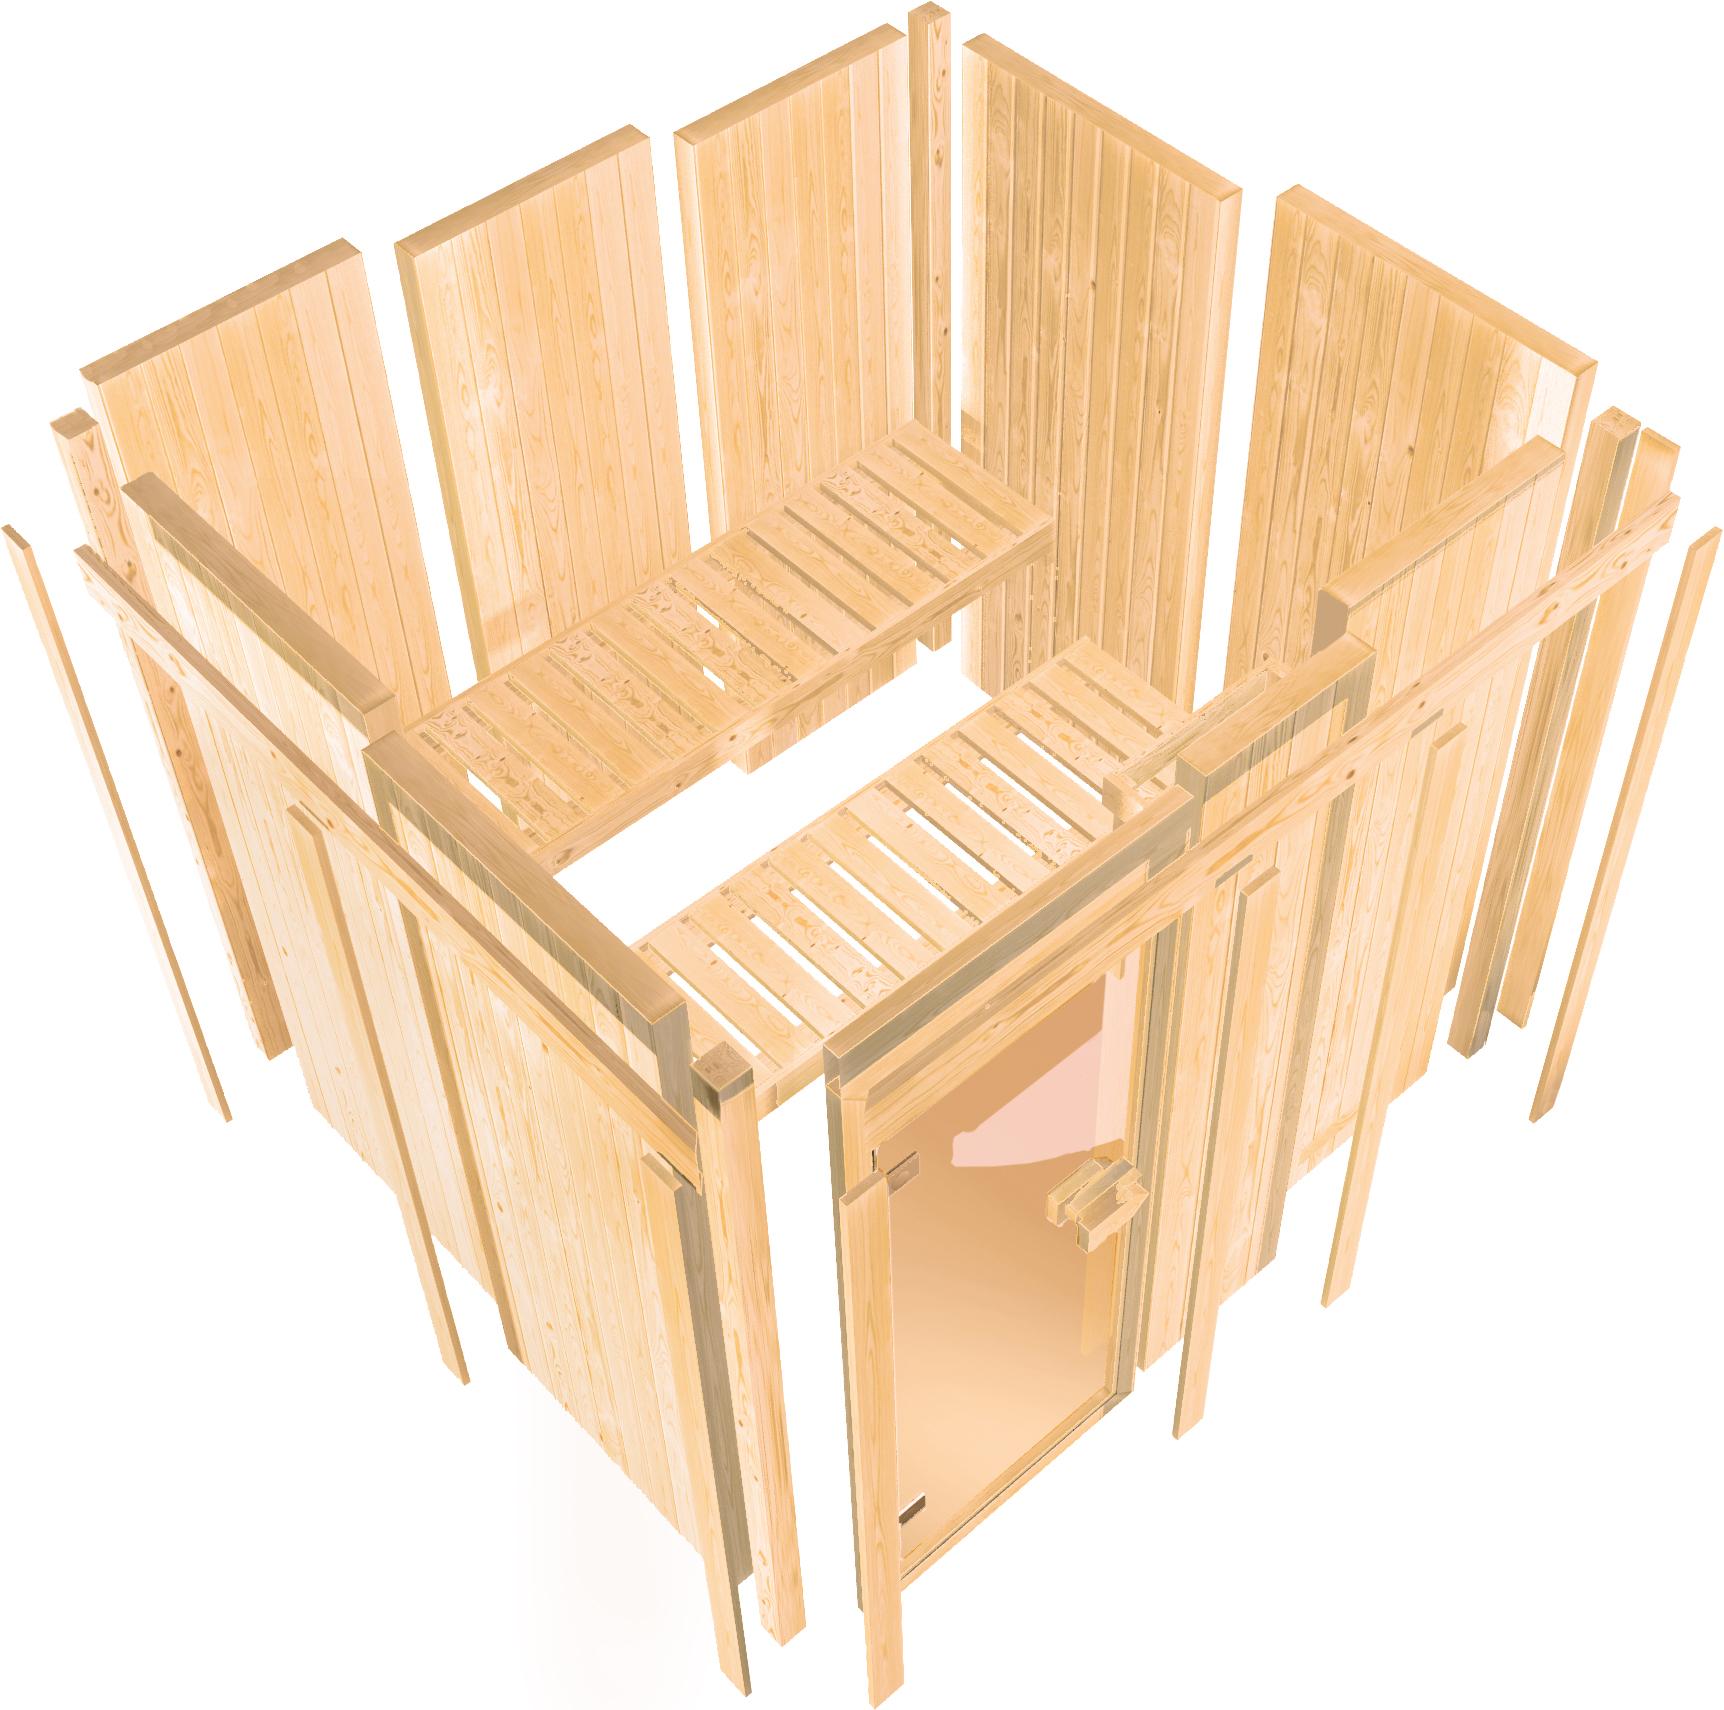 Woodfeeling Sauna Oulu 68mm ohne Saunaofen Bild 8